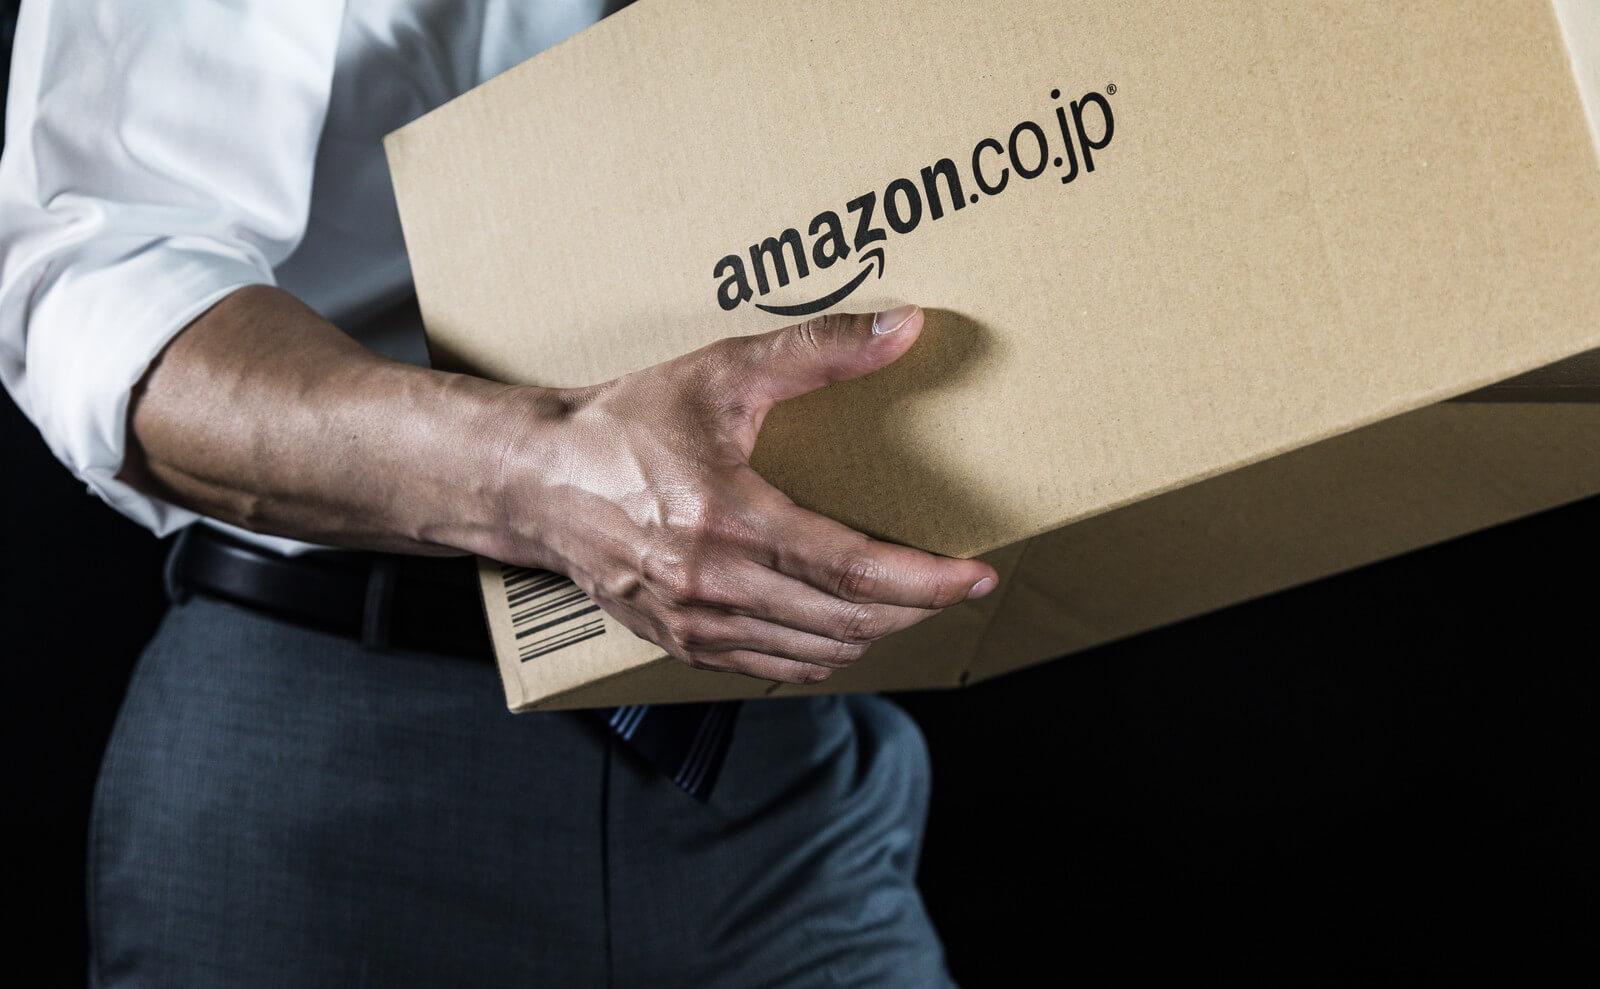 Amazonの箱を持つ男性